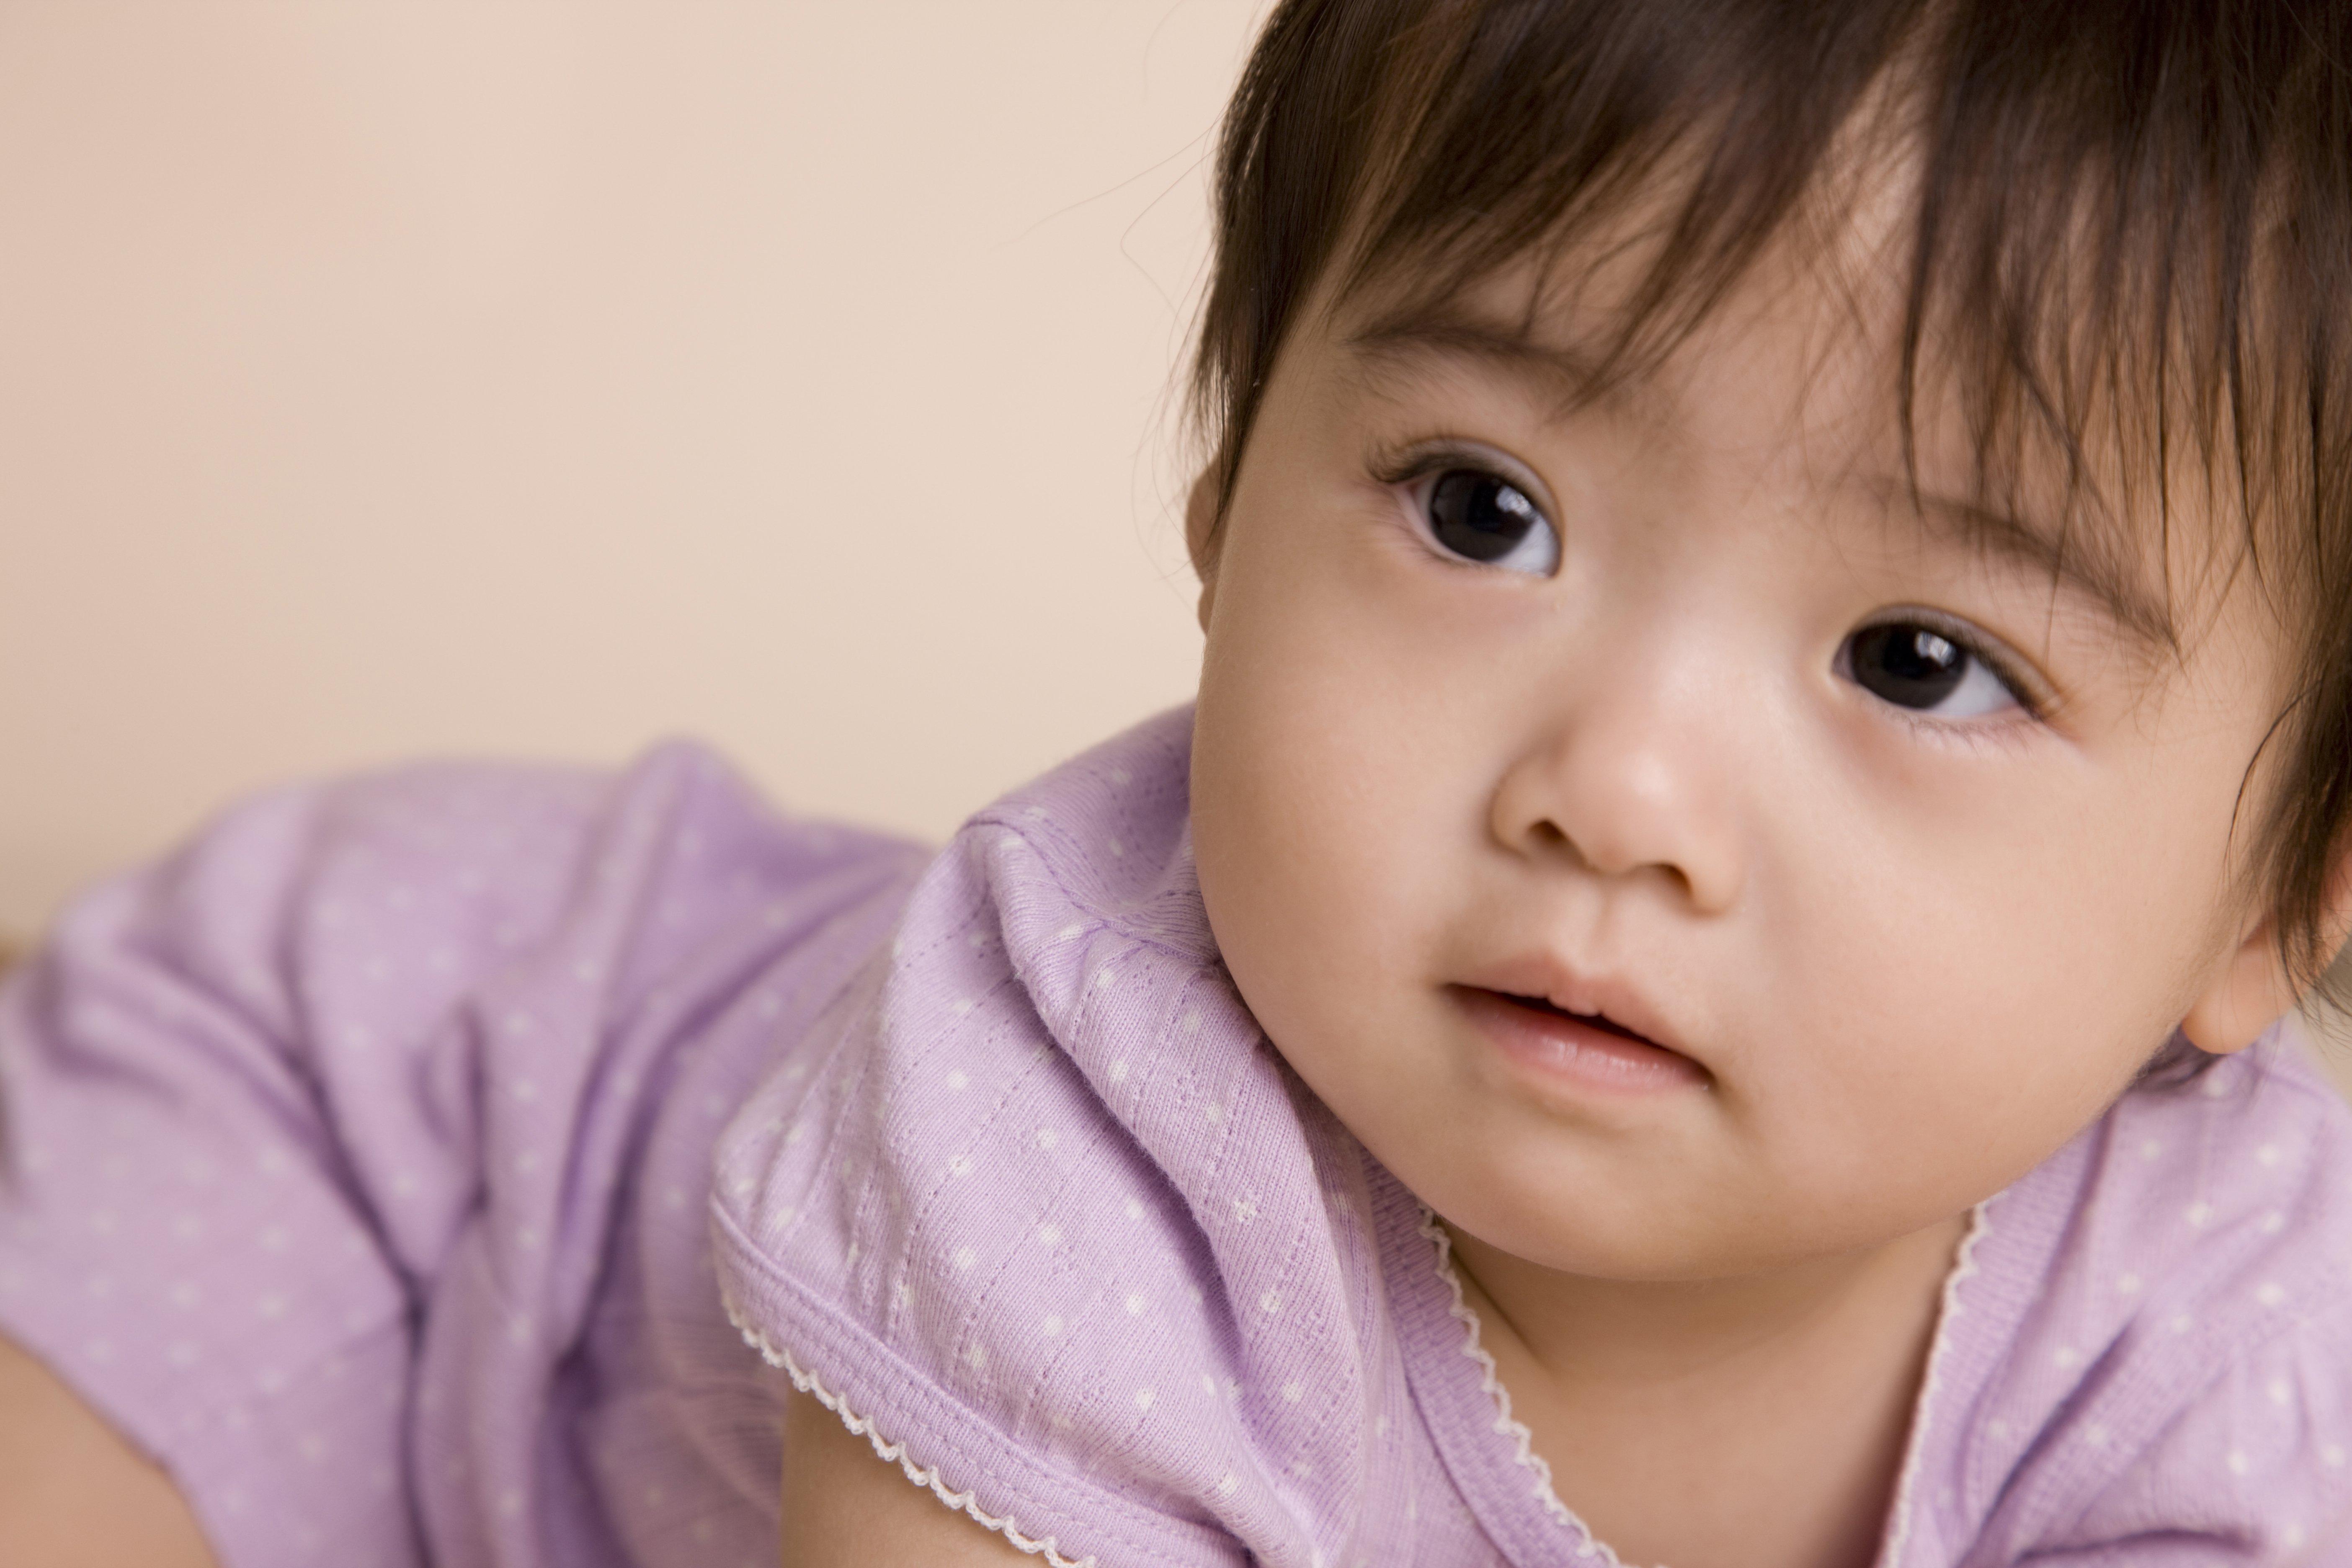 Closeup of baby in purple onesie.